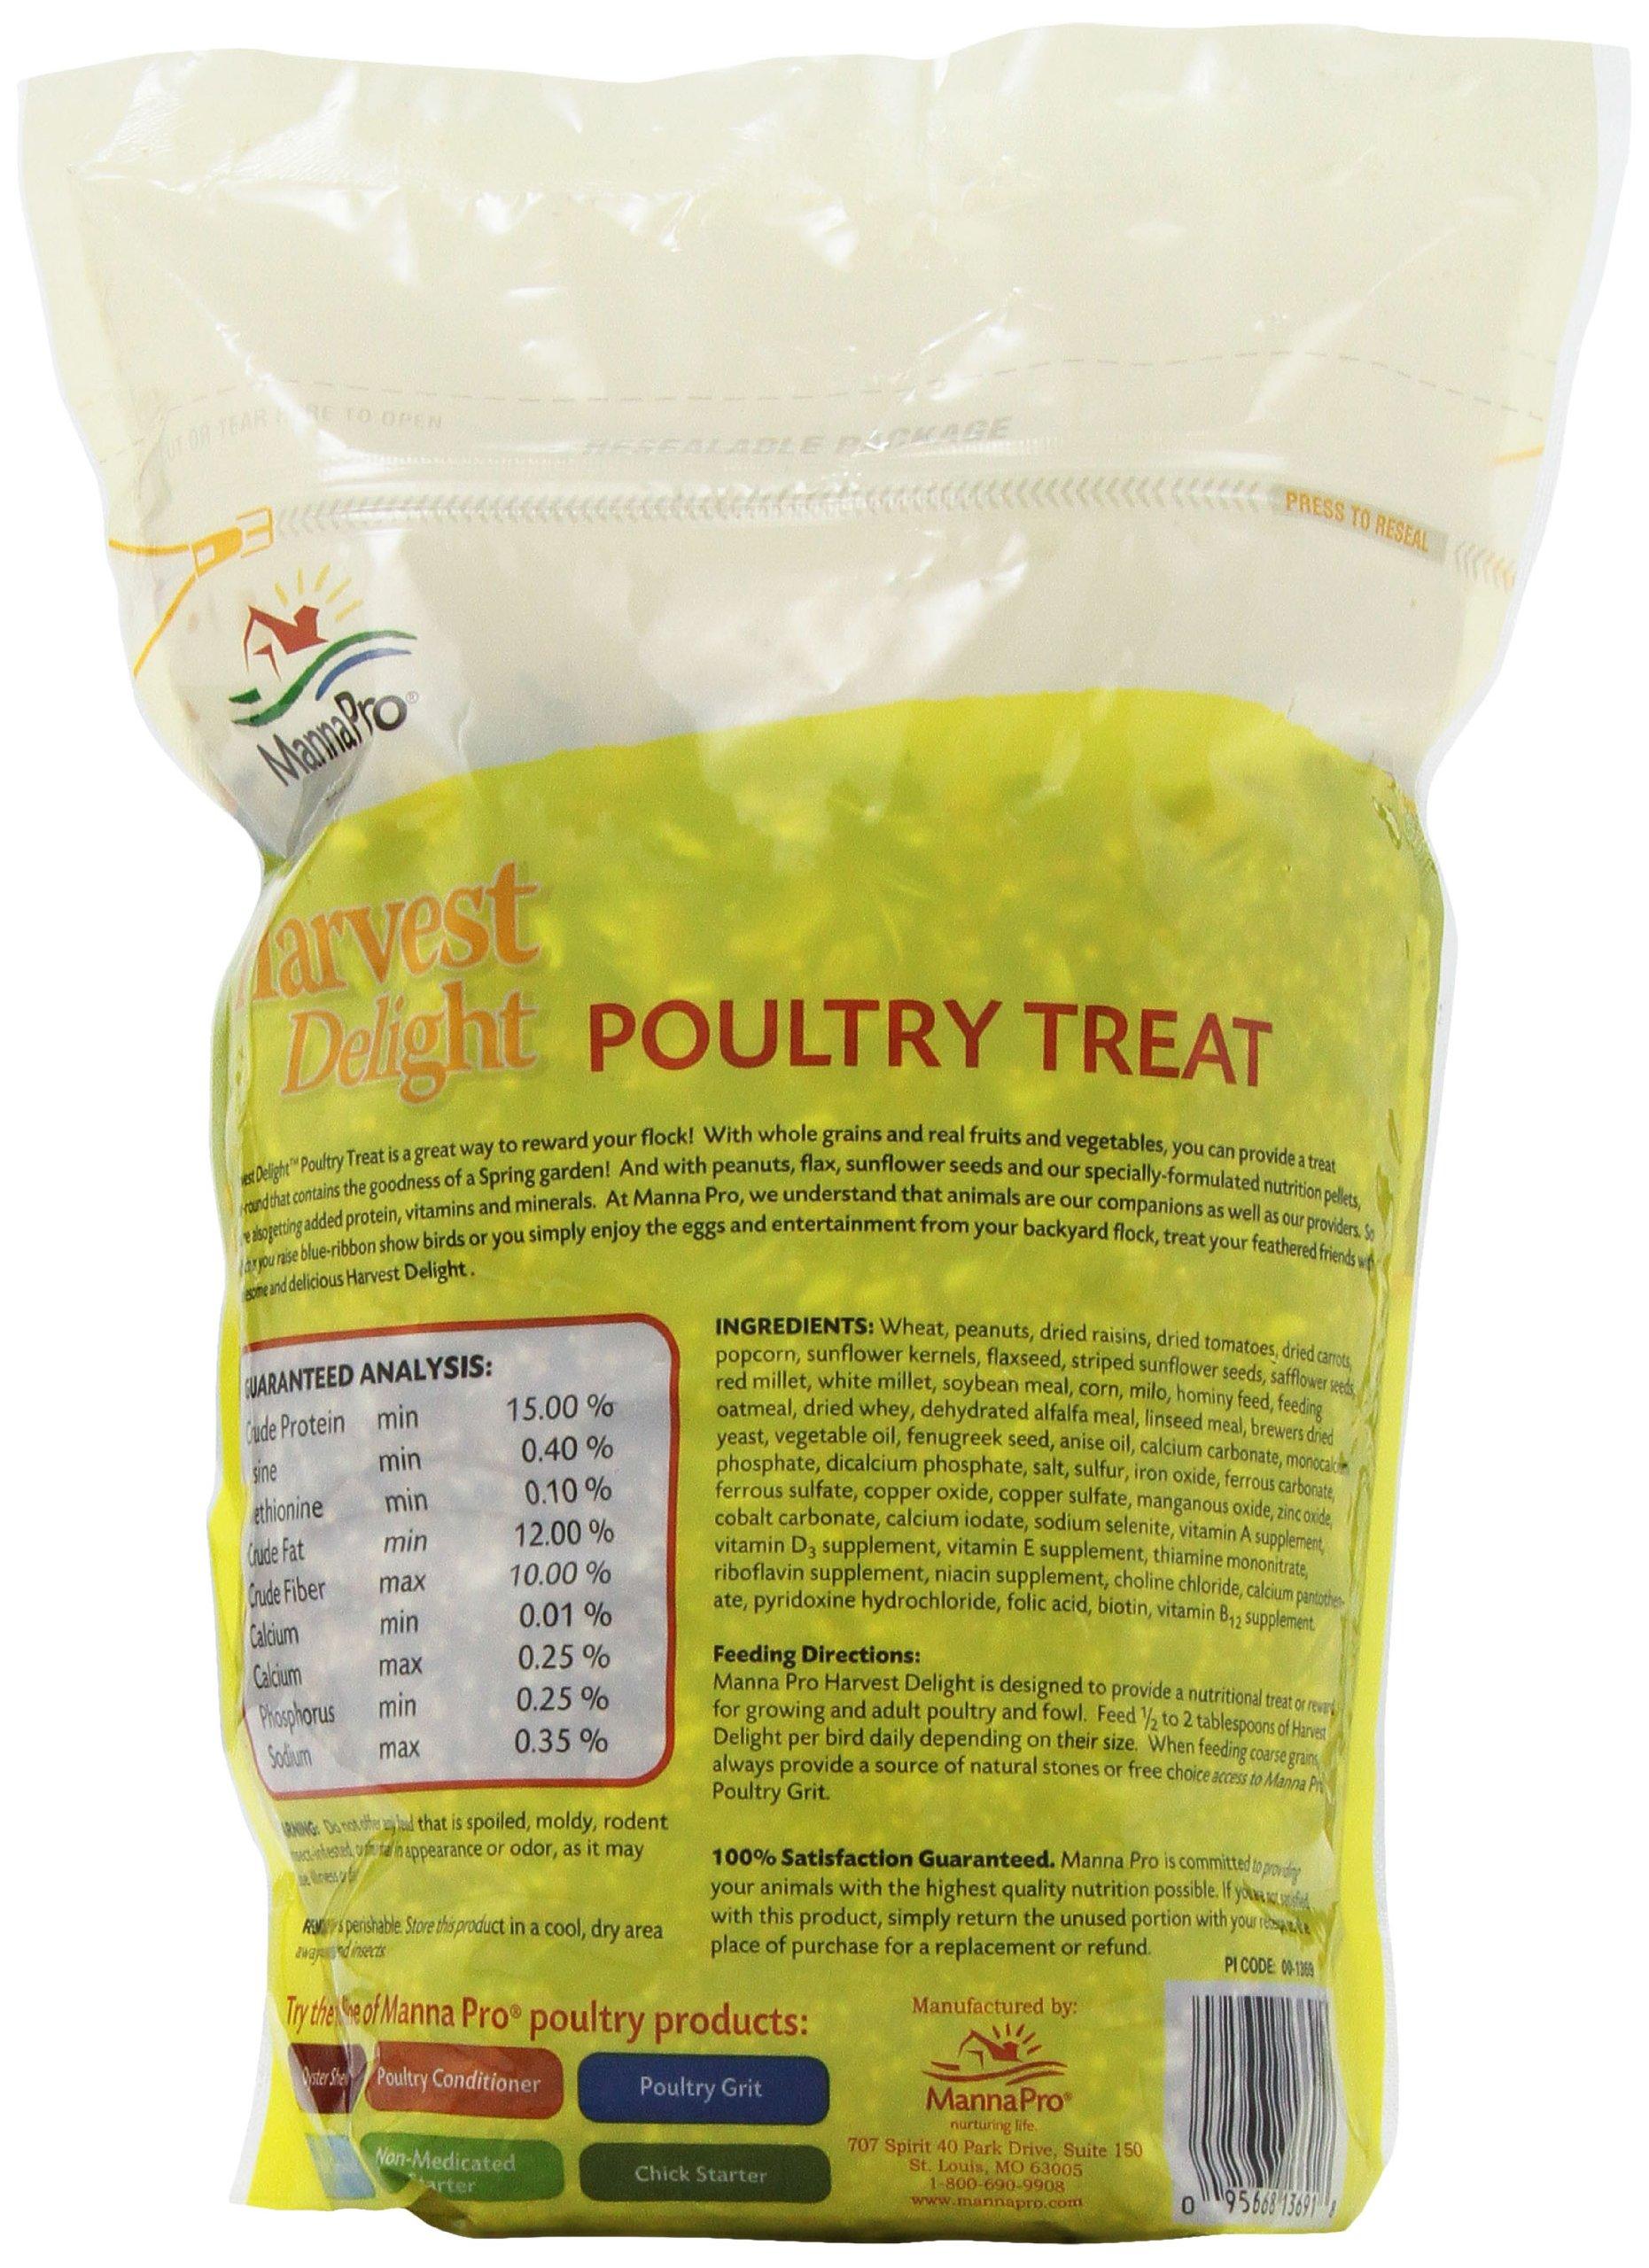 Manna Pro Harvest Delight Poultry Treat, 2.5 lb